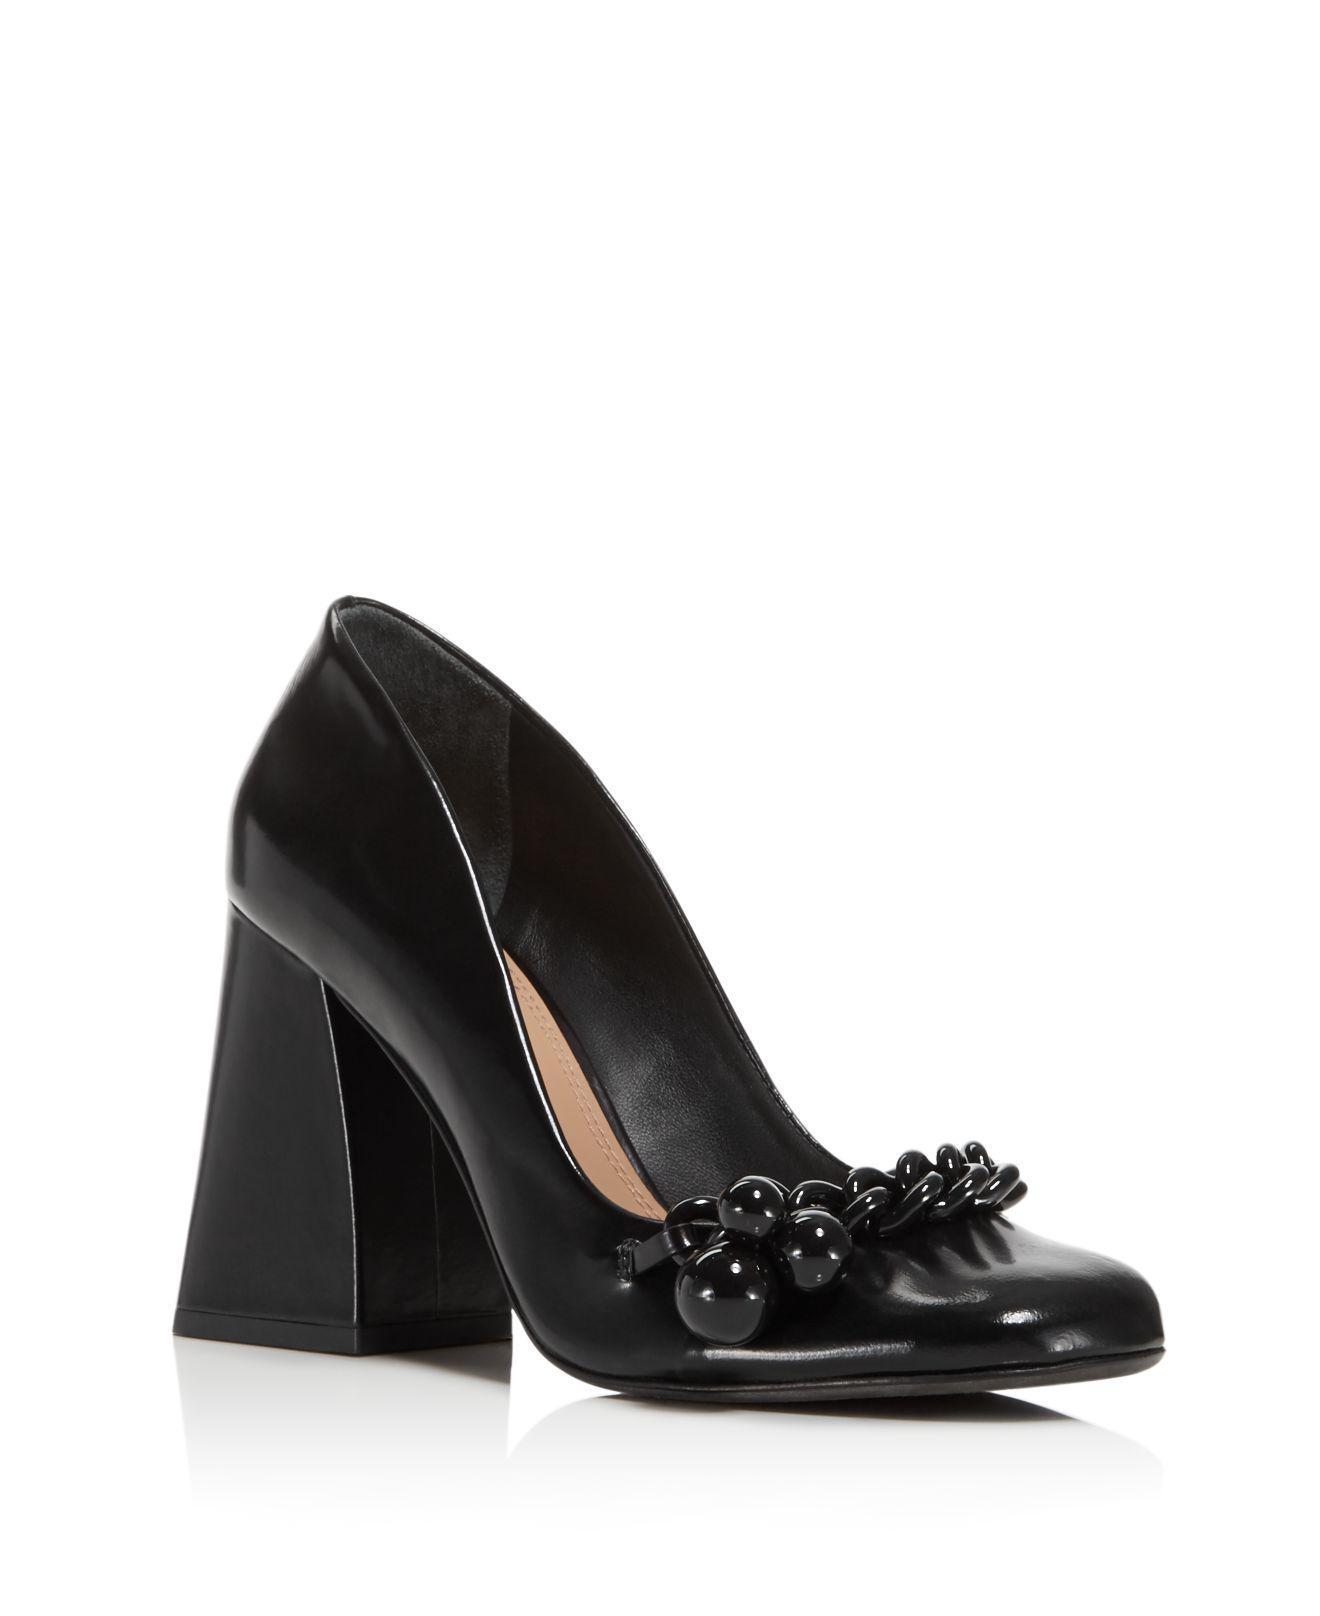 9a01bd3ce2df4 Lyst - Tory Burch Addison High Block Heel Pumps in Black